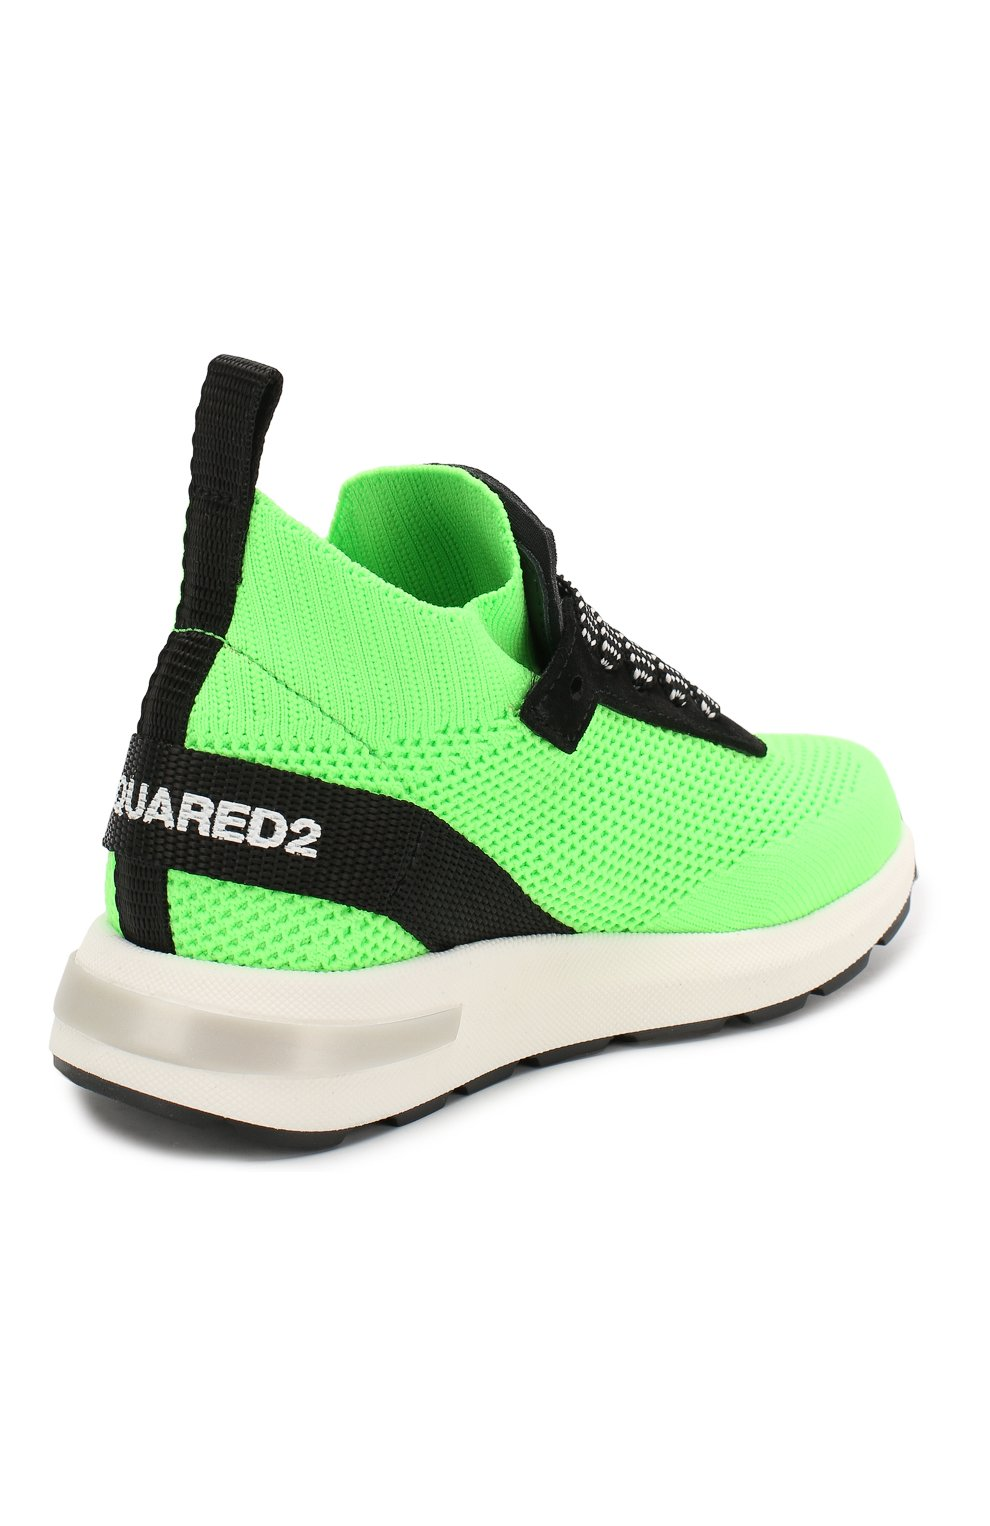 Детские кроссовки DSQUARED2 зеленого цвета, арт. 63518/18-27 | Фото 3